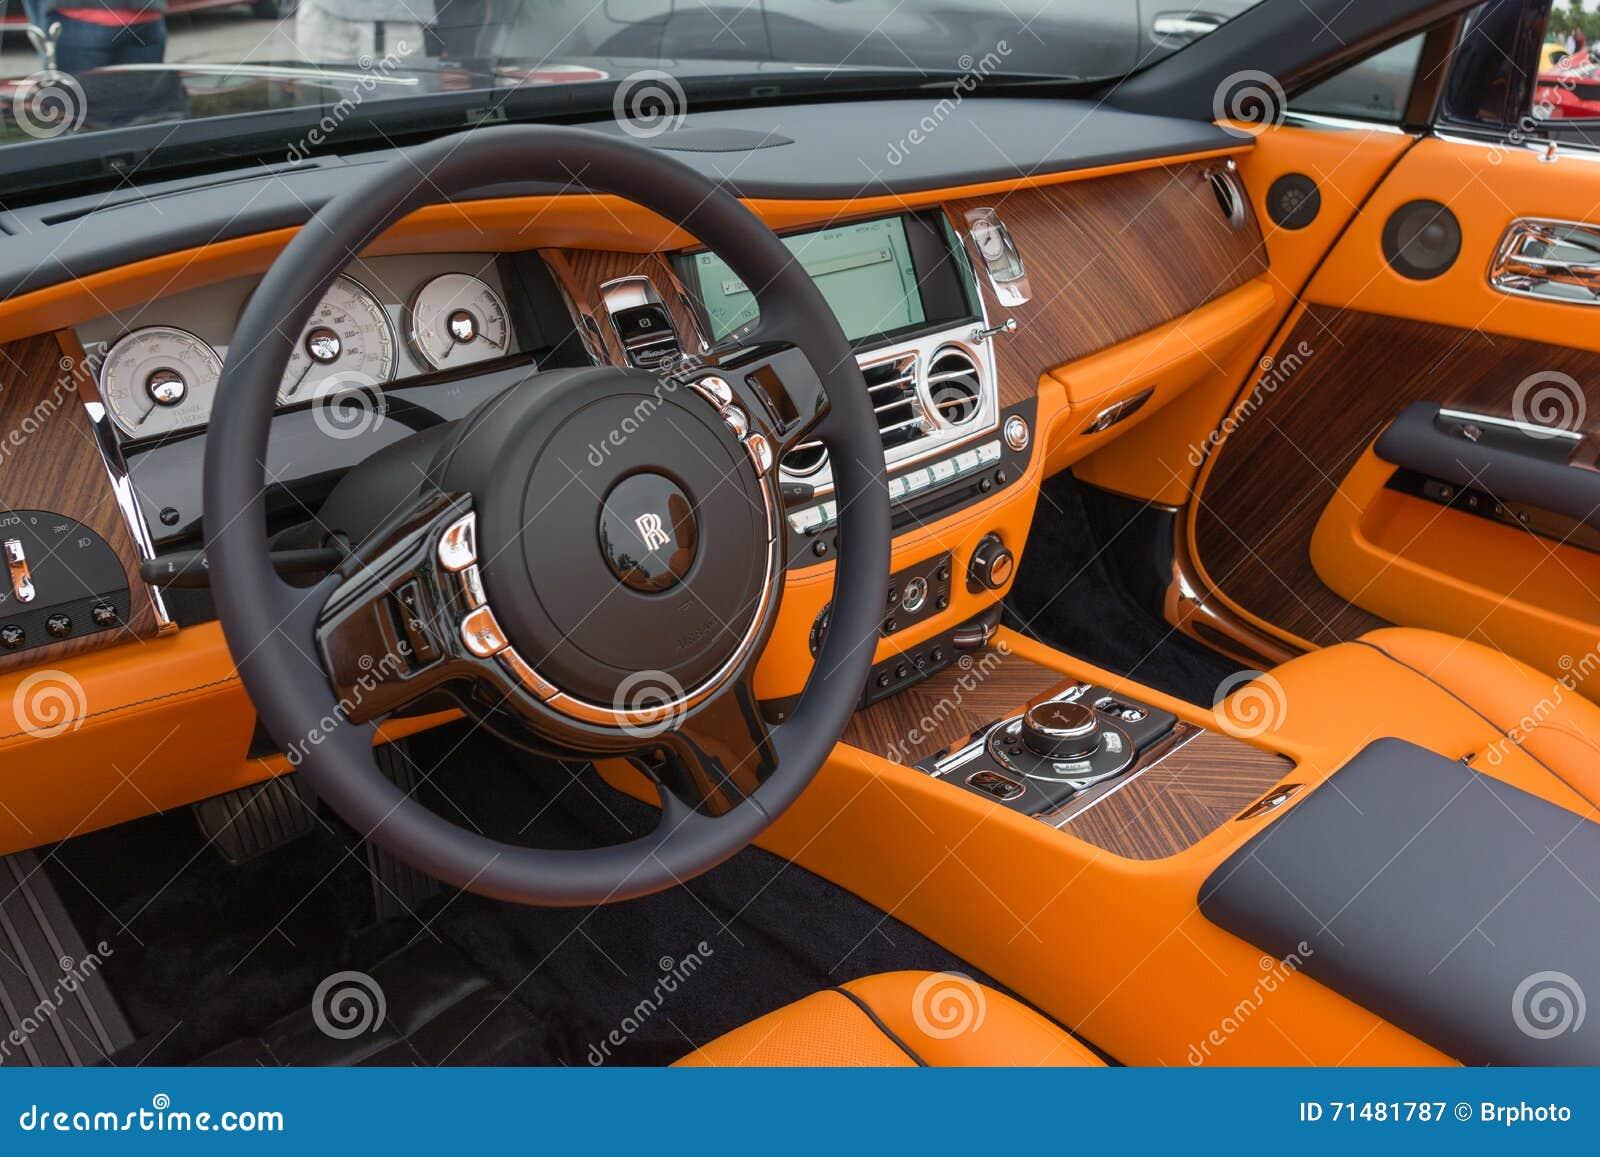 rolls royce phantom interior editorial photography image of auto luxury 71481787 dreamstime com